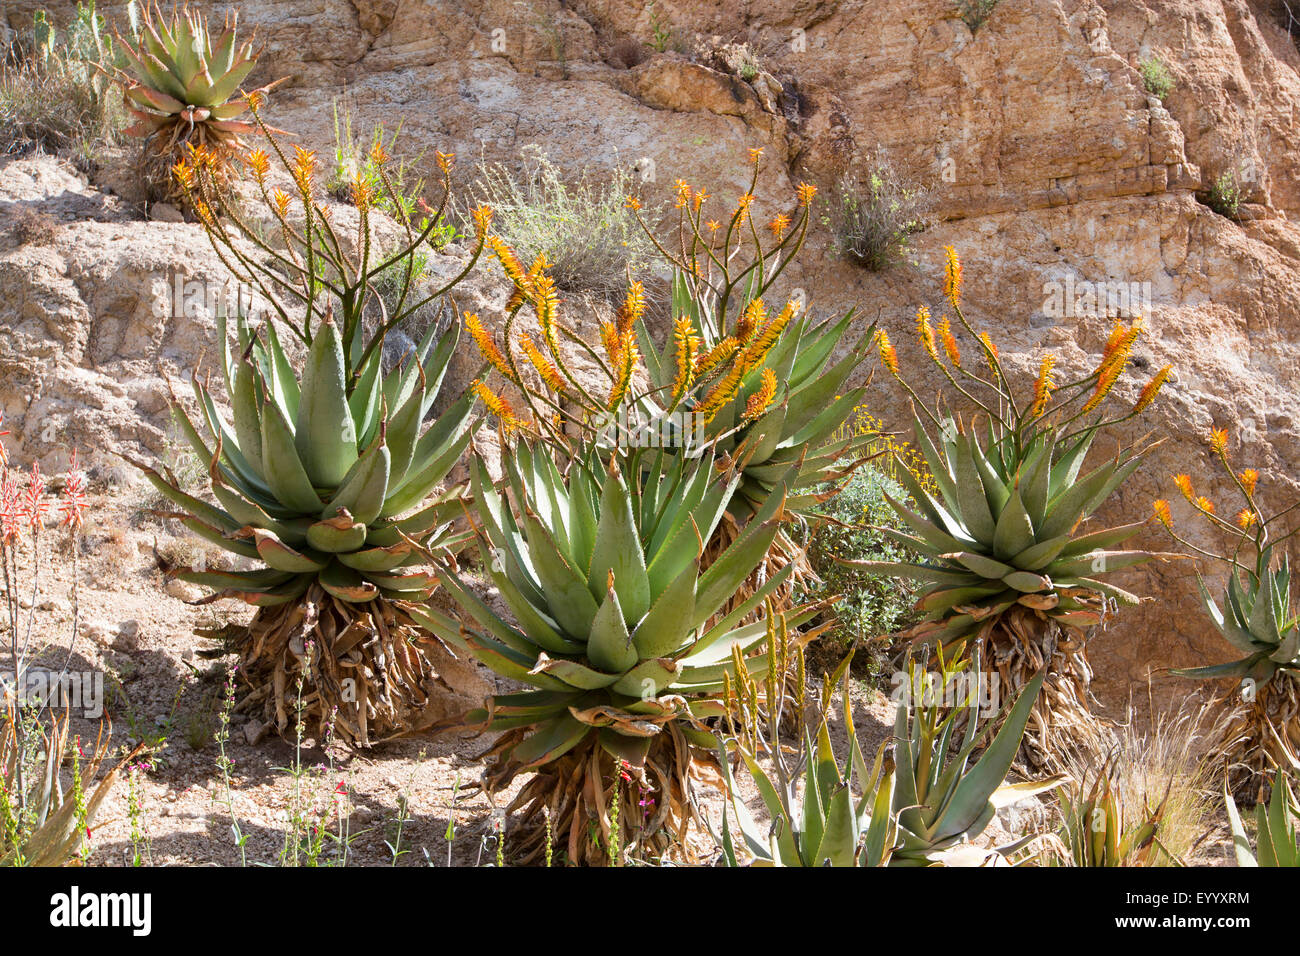 Mountain Aloe, piatto flowerd Aloe, grande spinosa aloe (Aloe marlothii), fioritura gruppo in corrispondenza di Immagini Stock